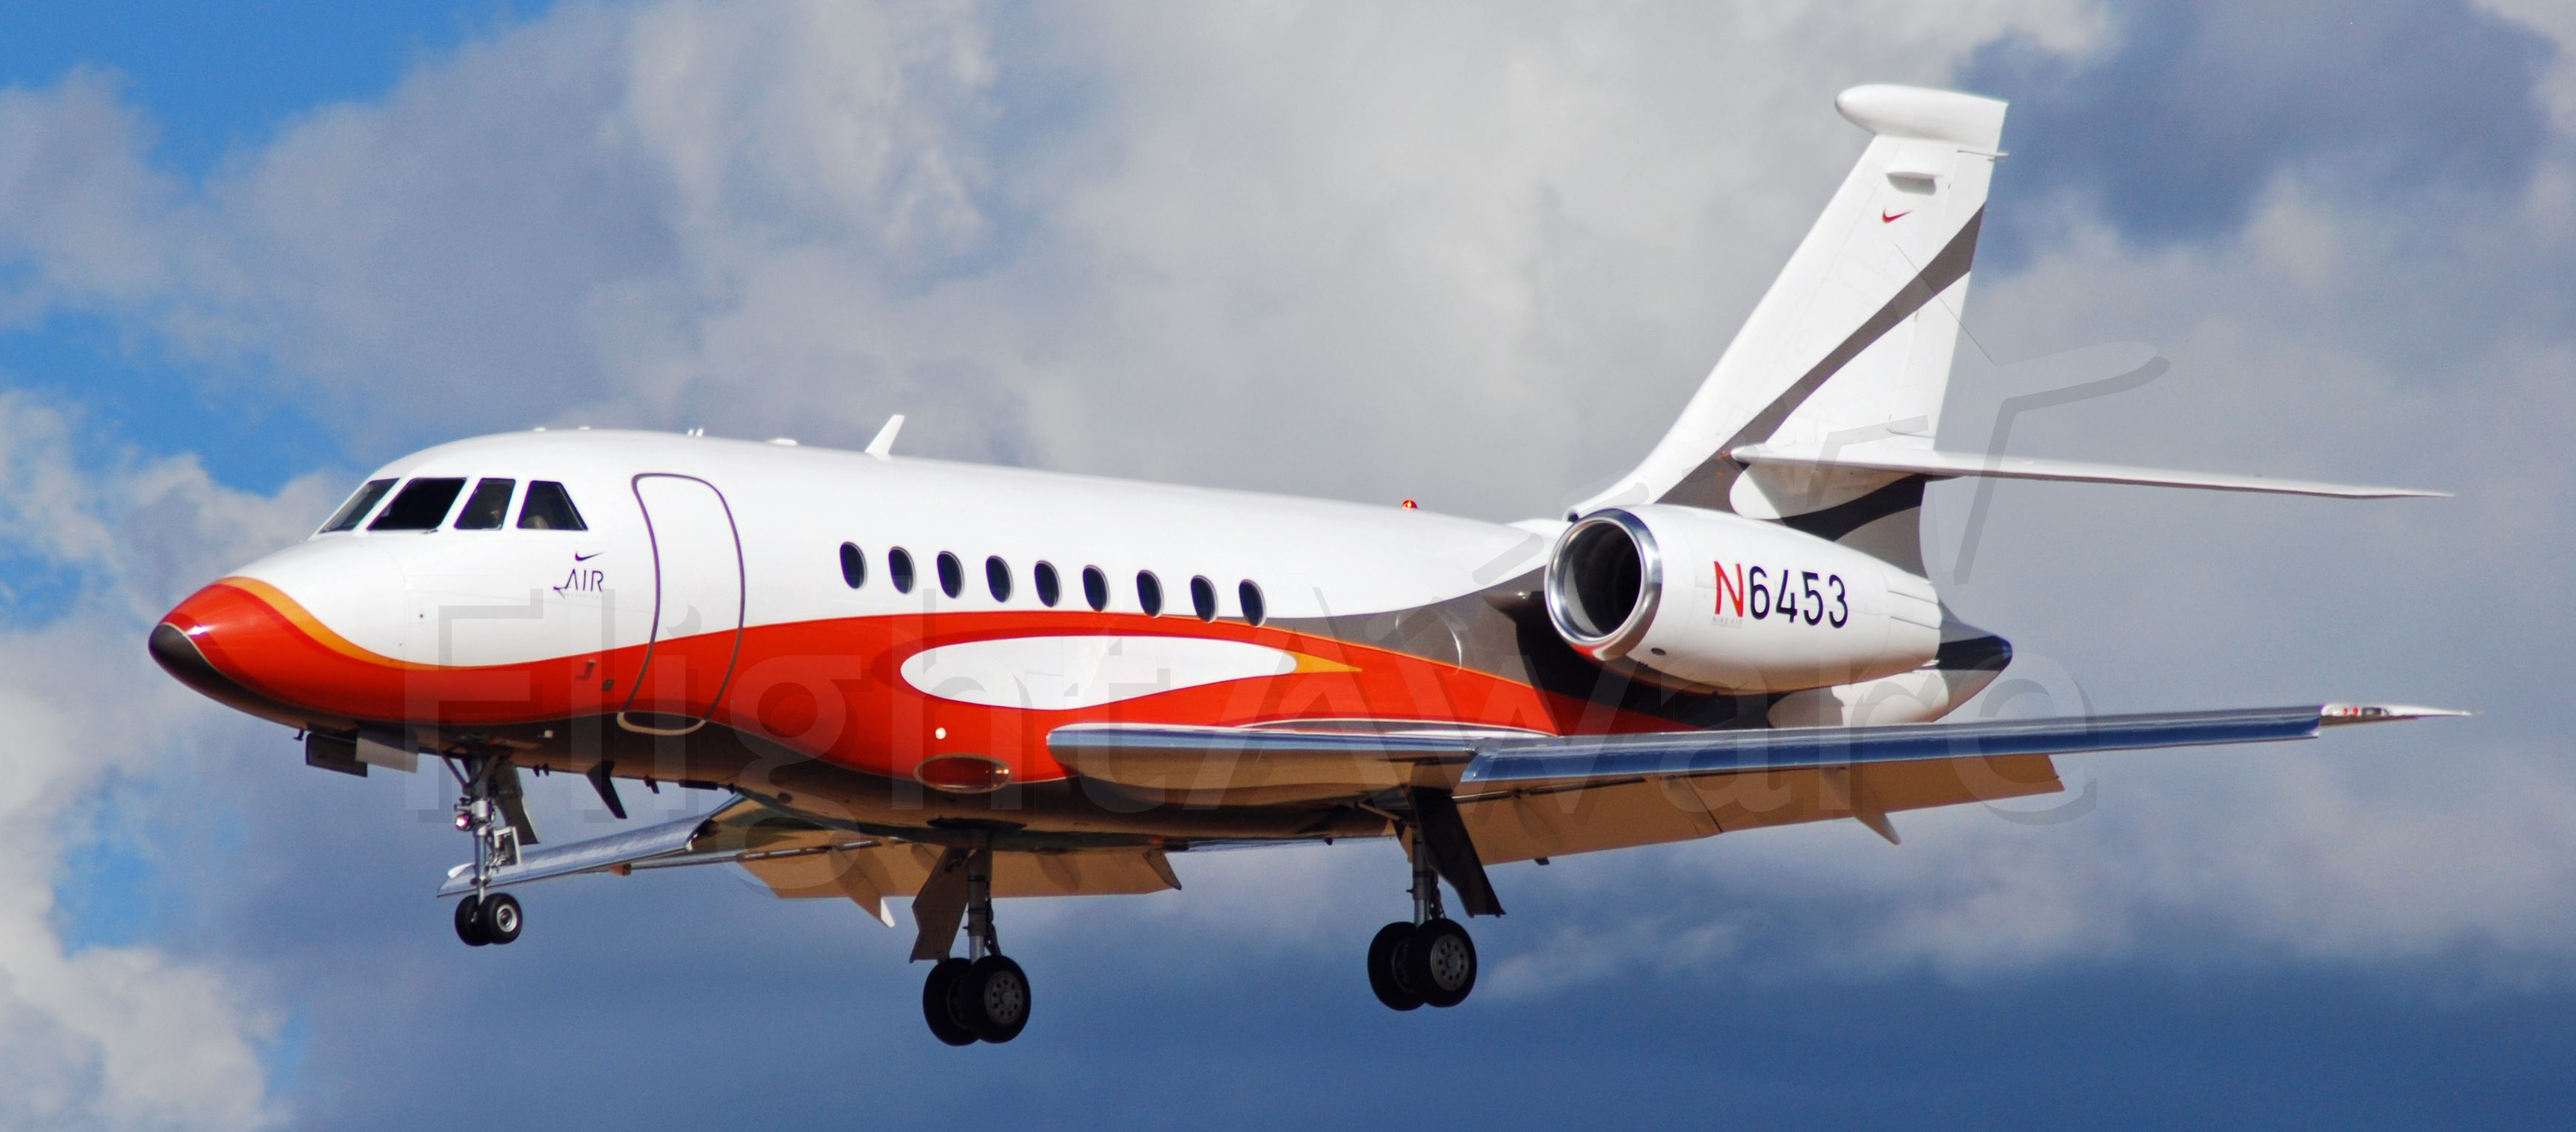 Dassault Falcon 2000 (N6453) - Nike Falcon on Final for Portland-Hillsboro Airport